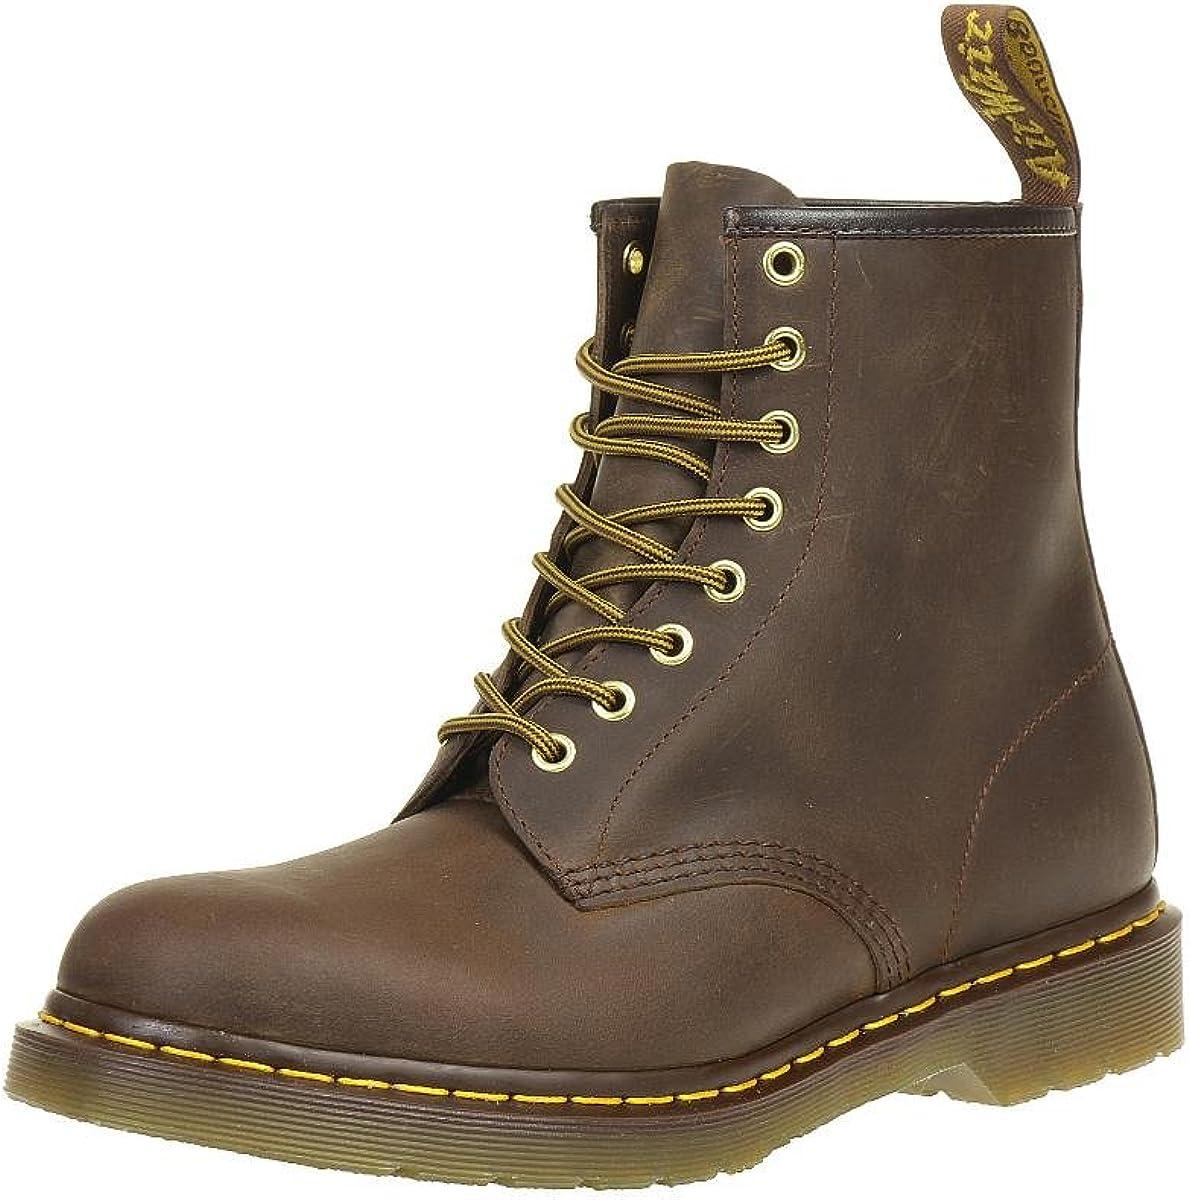 Dr. Martens mens 1460 8 Eye Boot